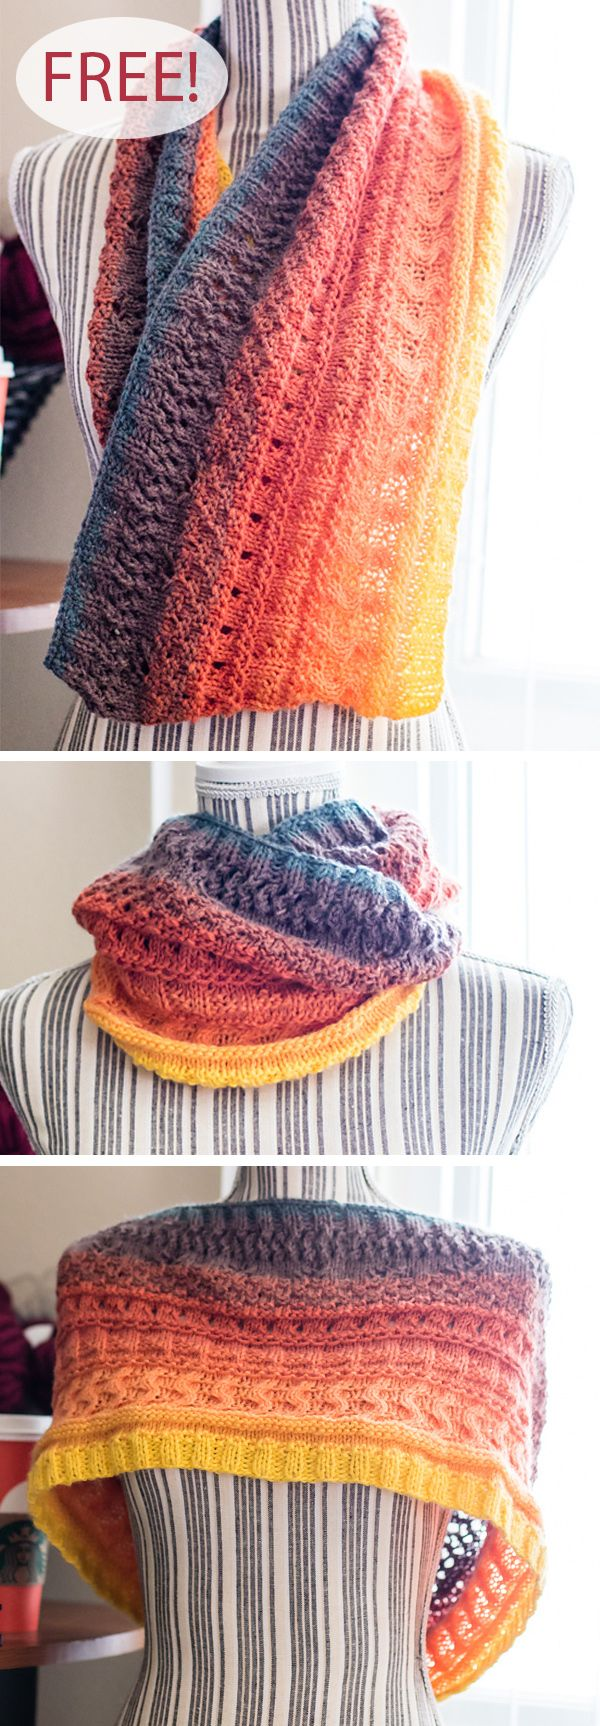 Free Knitting Pattern for Mandala Cowl